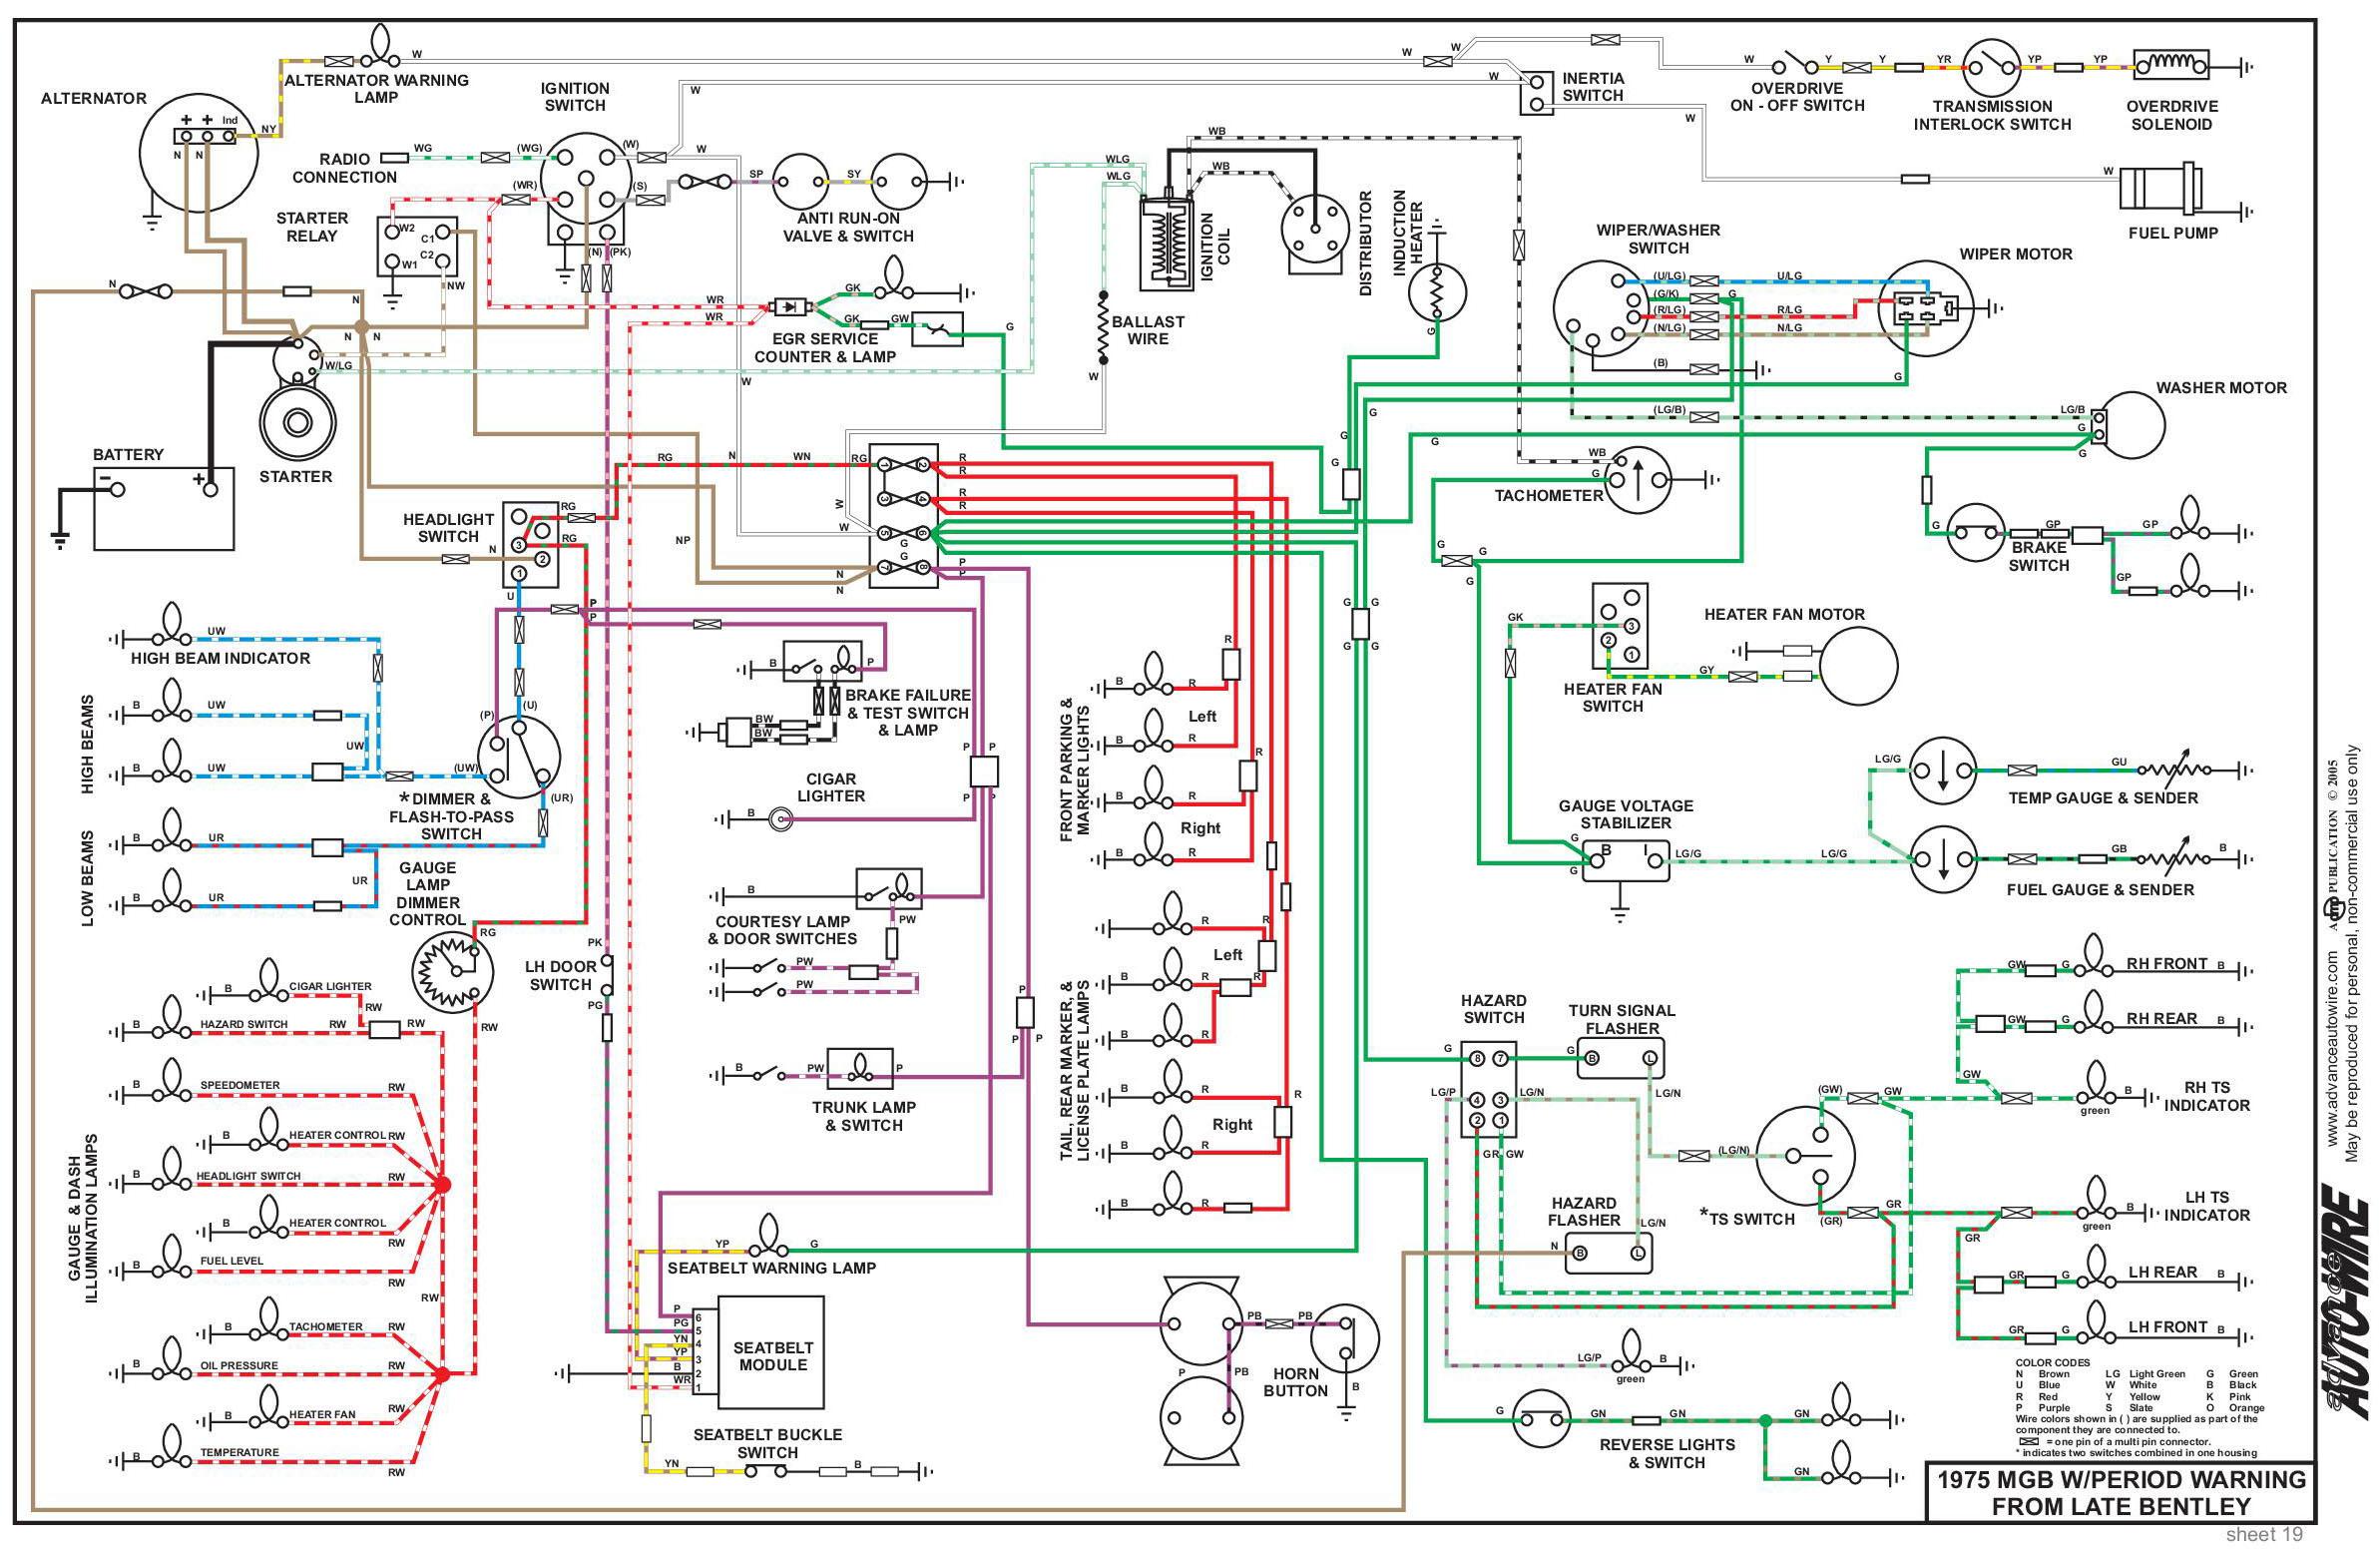 1973 mg mgb wiring diagram schematic ll 5721  mgb starter wiring diagram moreover chevy mini starter  mgb starter wiring diagram moreover